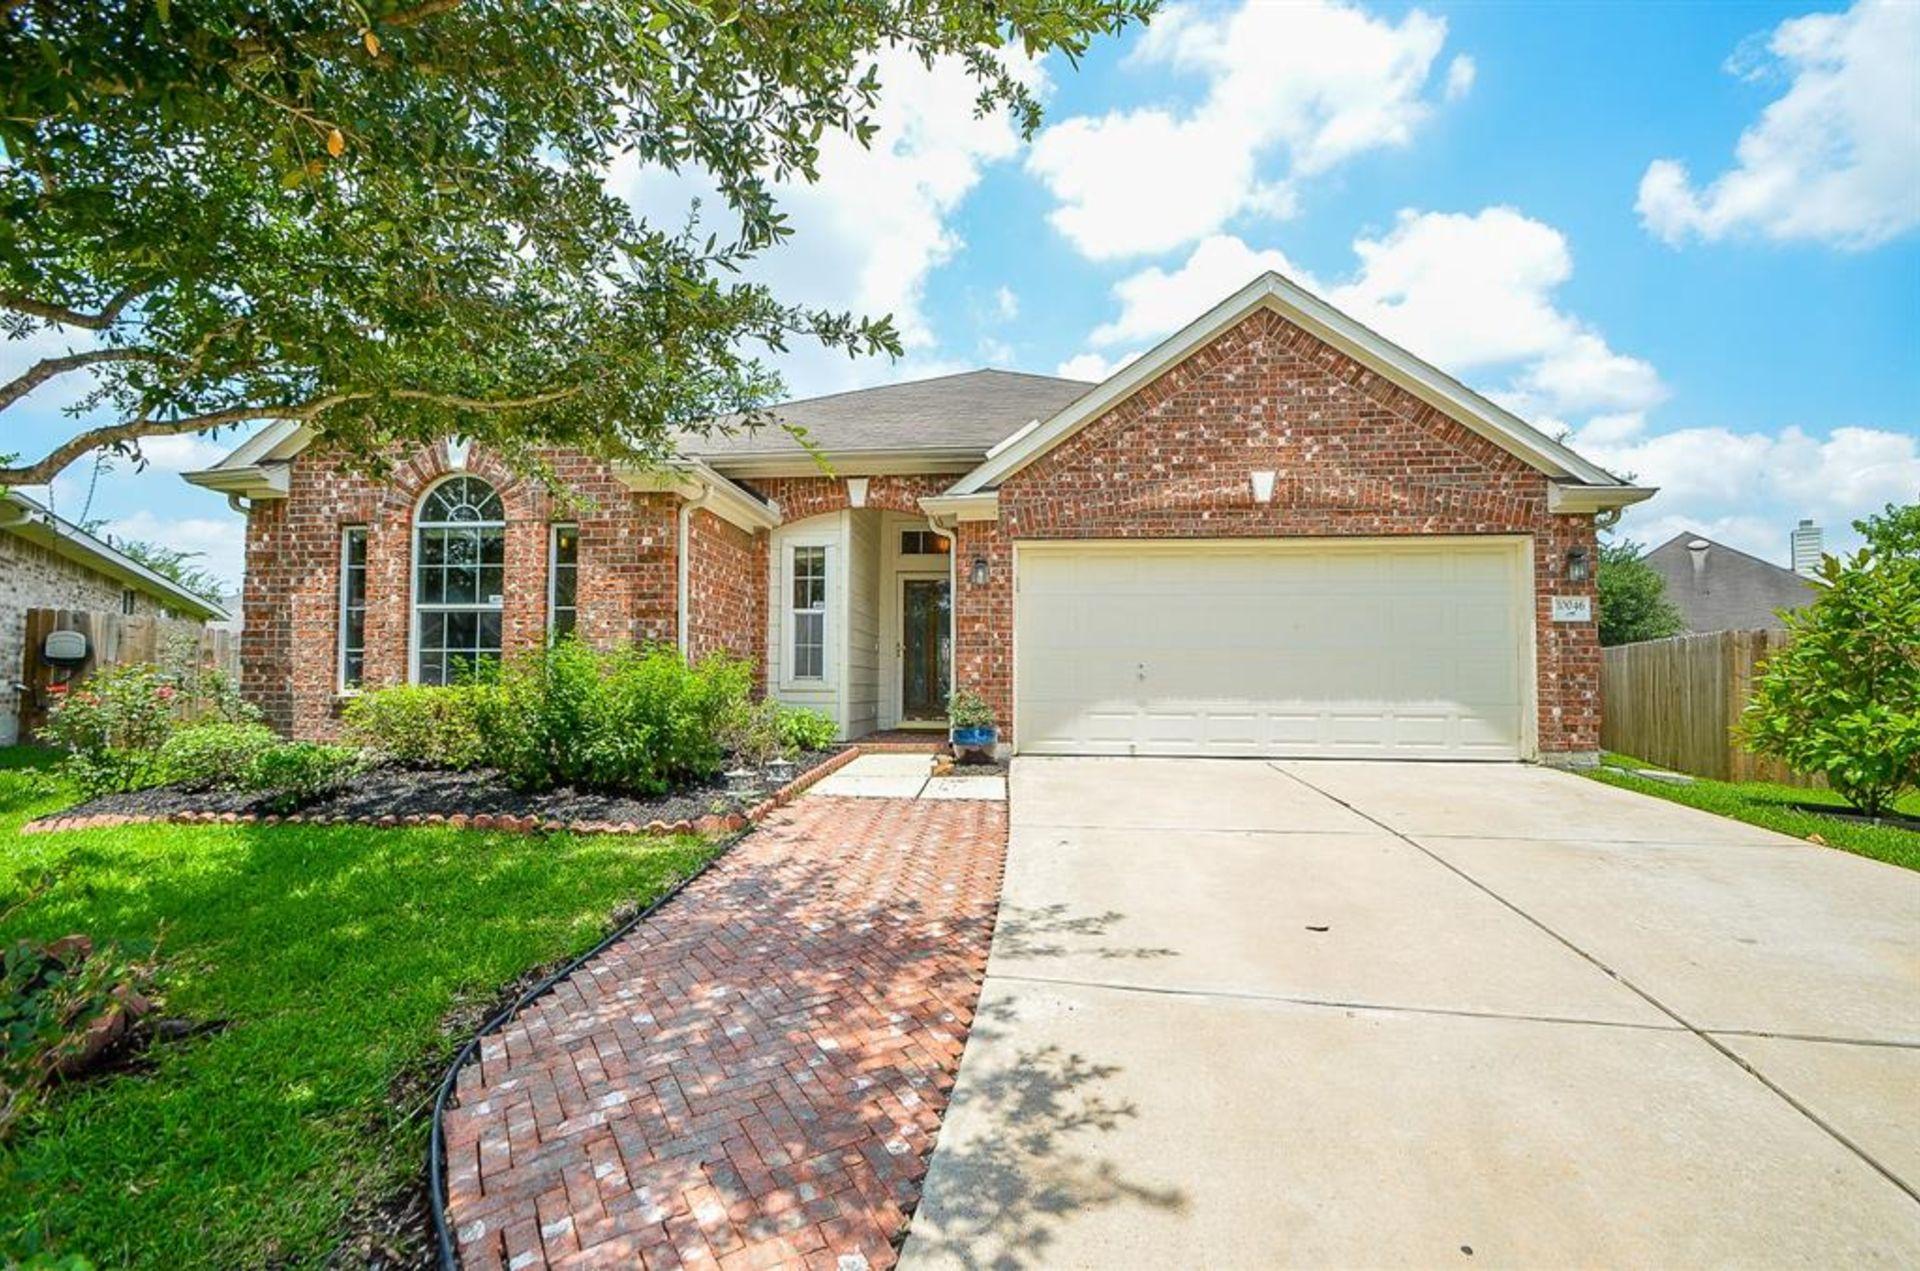 Houston Houses For Sale: 10046 Deer Track Court 77064